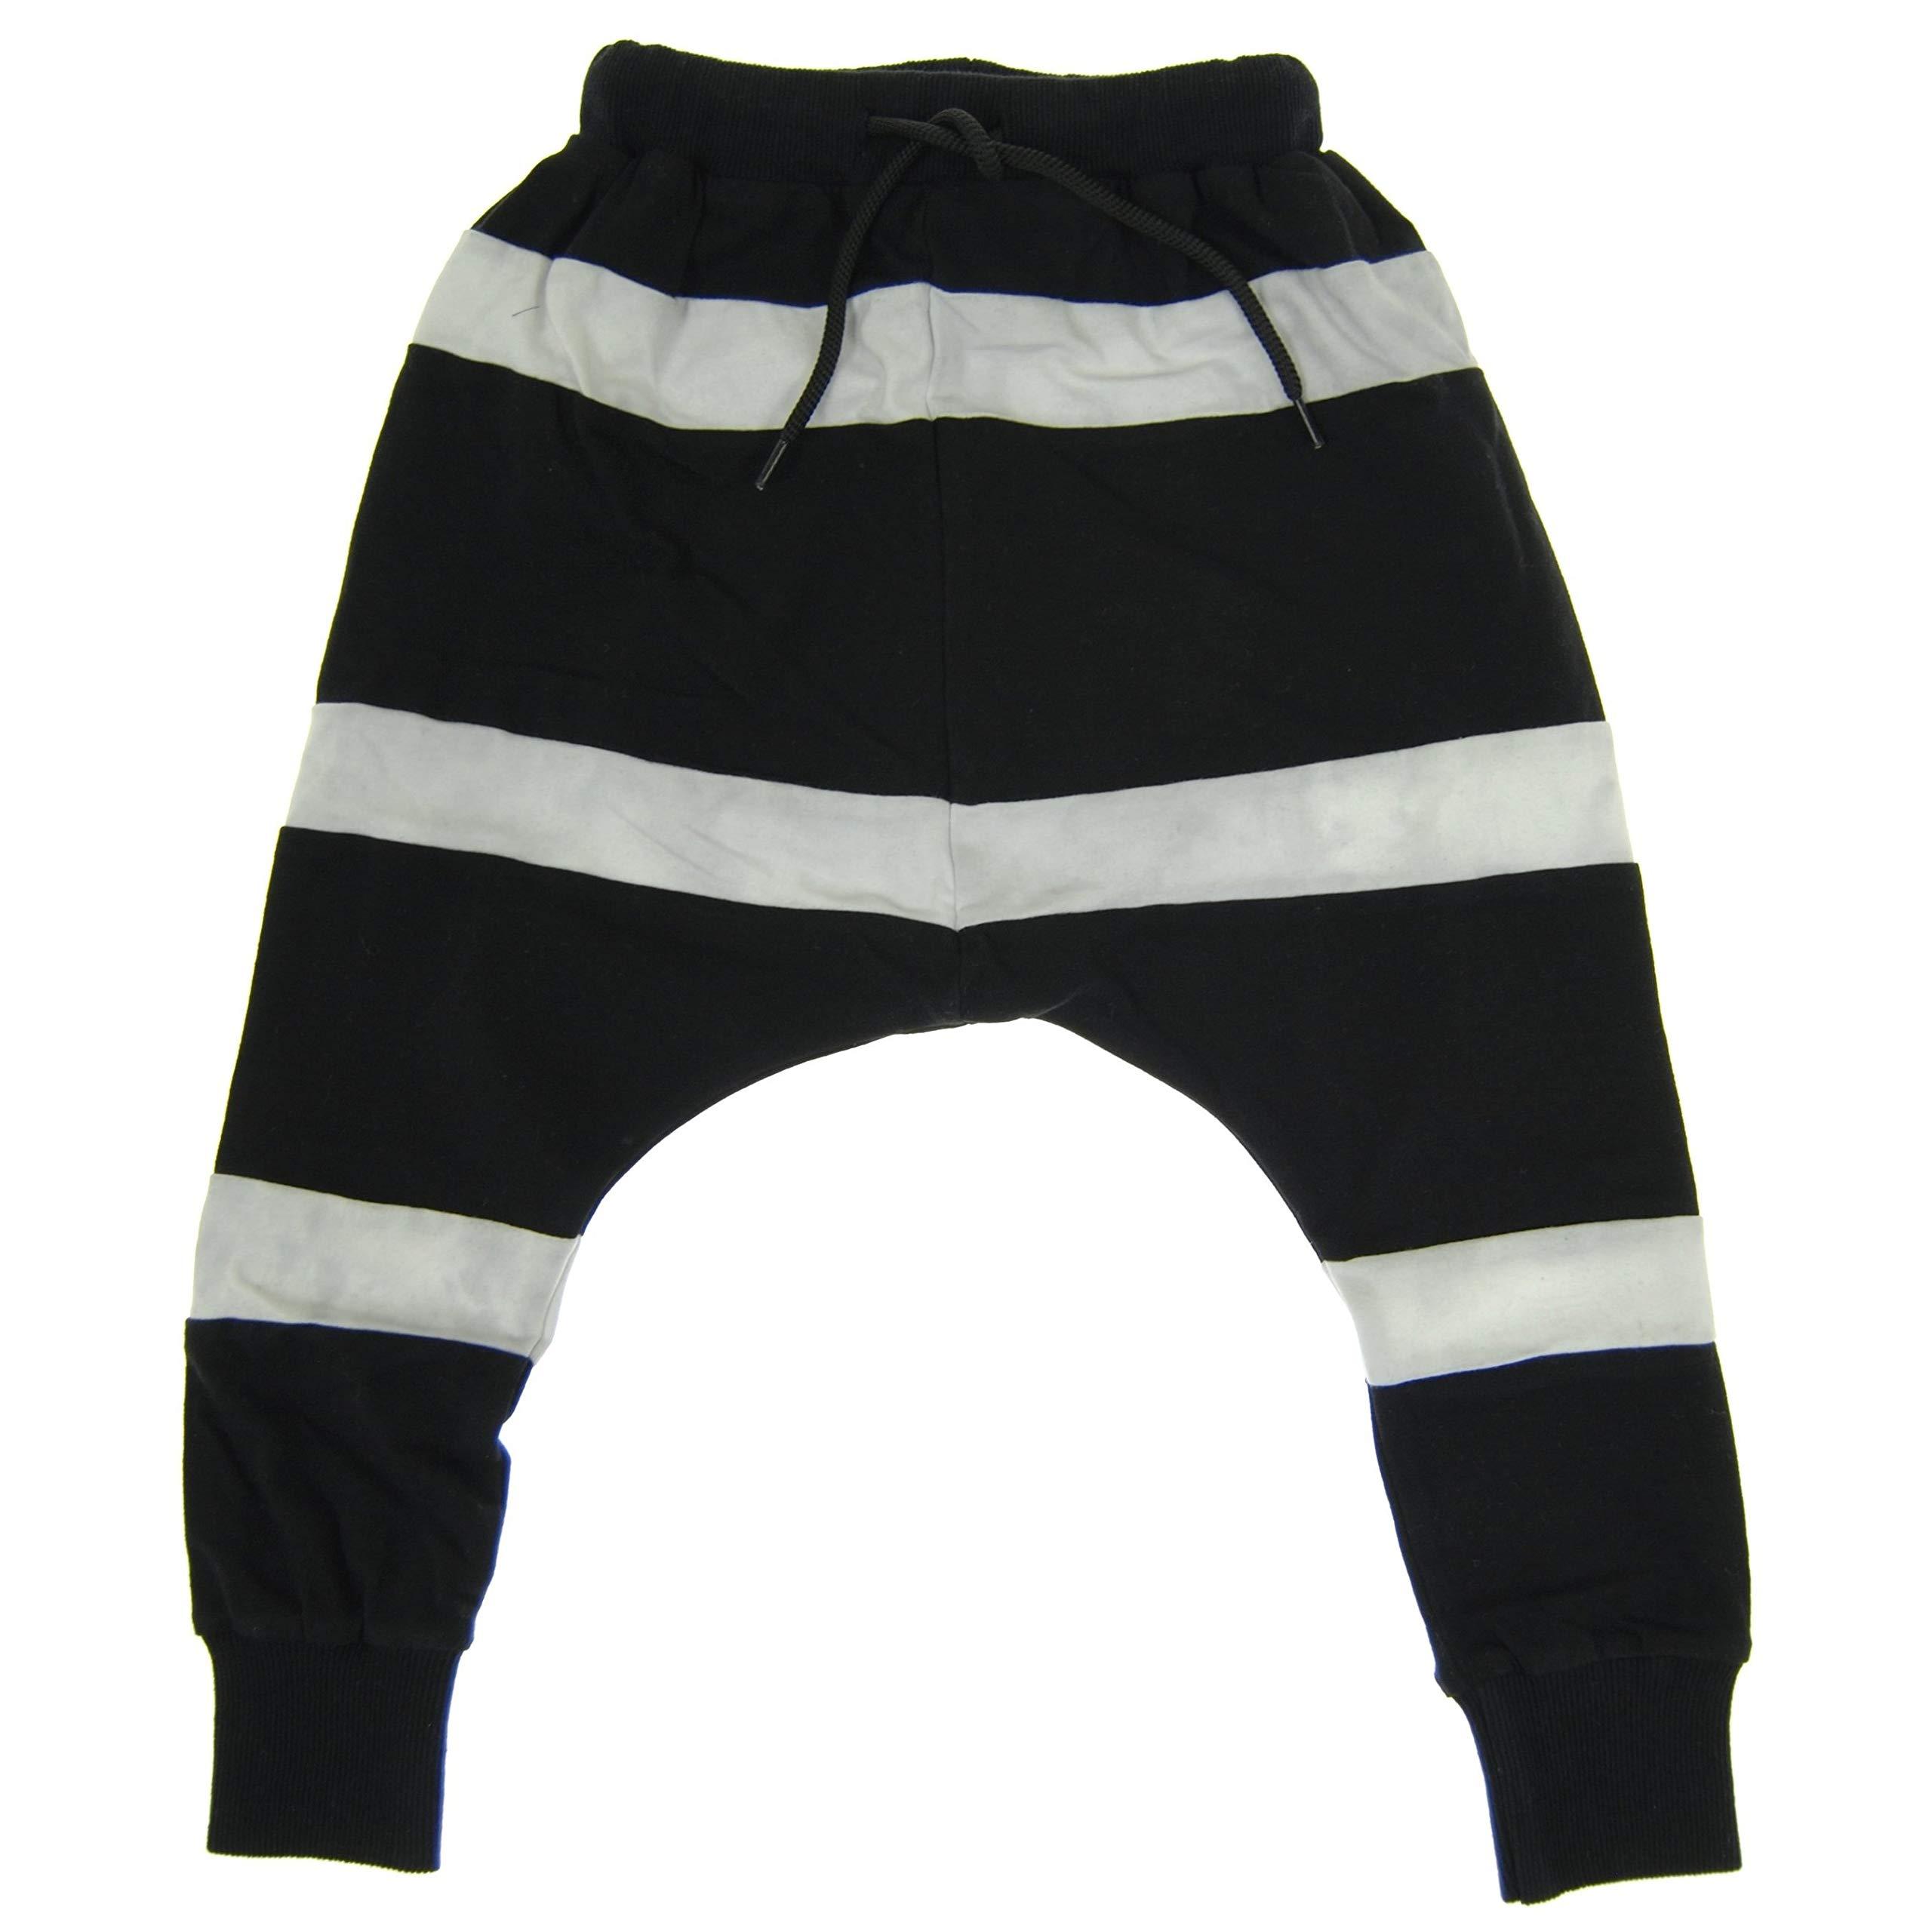 Mini Shatsu Black and White Striped Sweat Pants